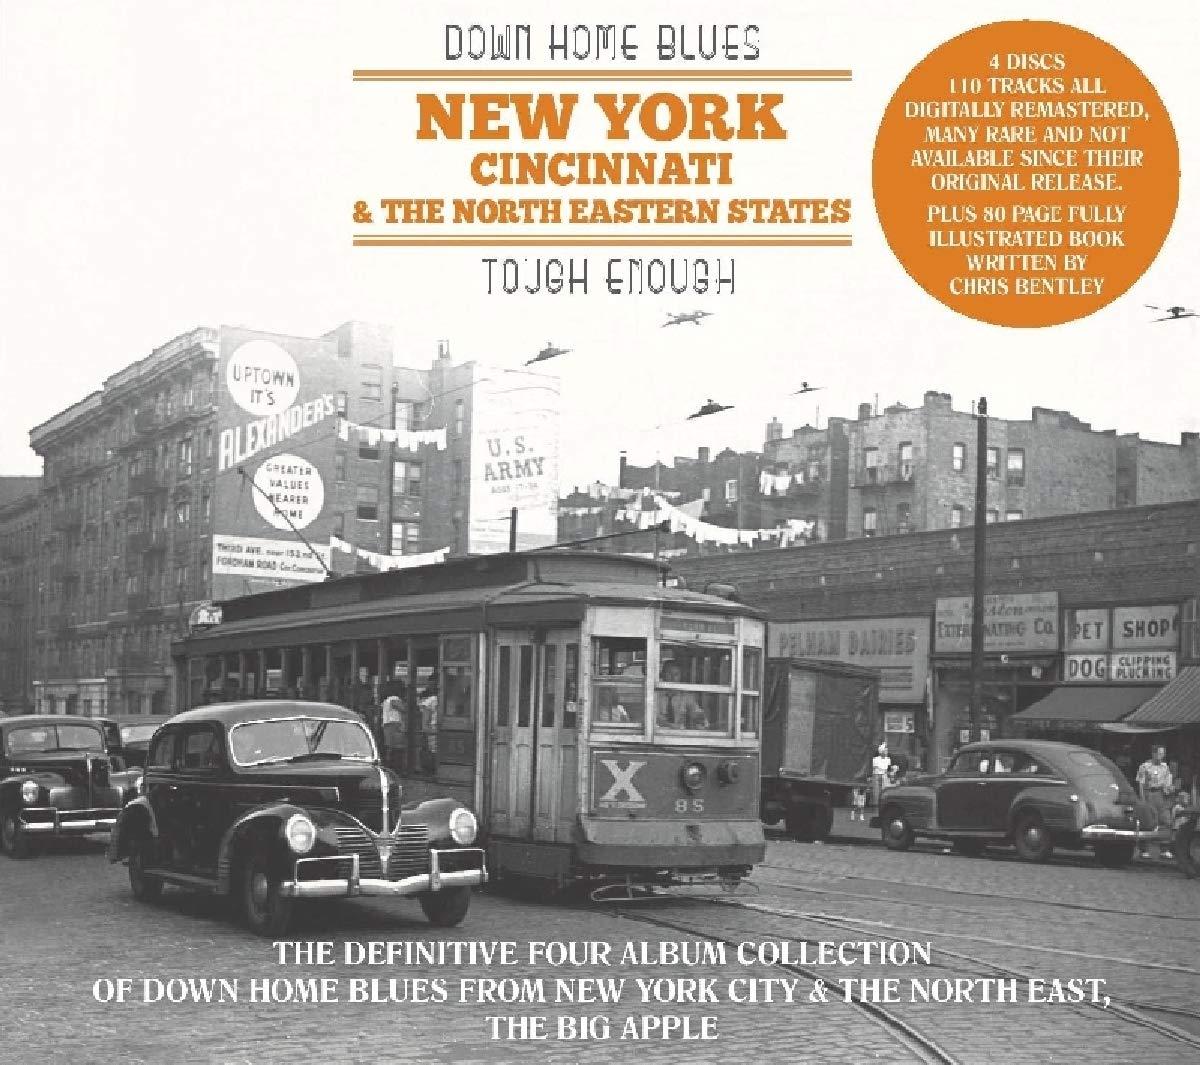 Down Home Blues: New York, Cincinnati & The North Eastern States: Tough Enough